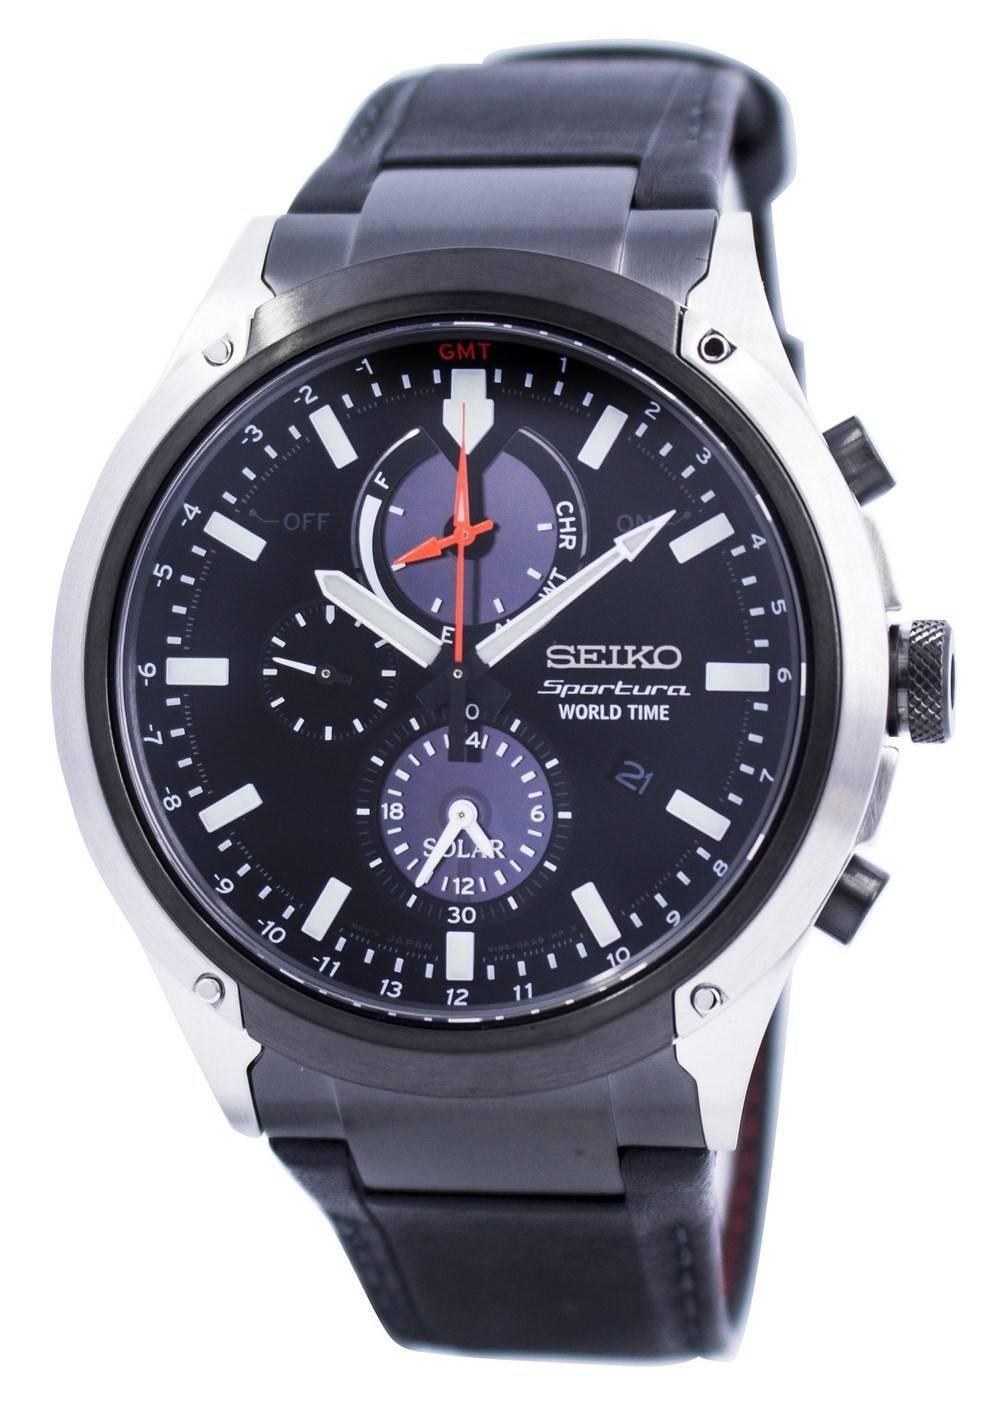 b0988a369a7 Relógio Seiko Sportura mundo tempo Solar Chronograph SSC483 SSC483P1  SSC483P masculino pt